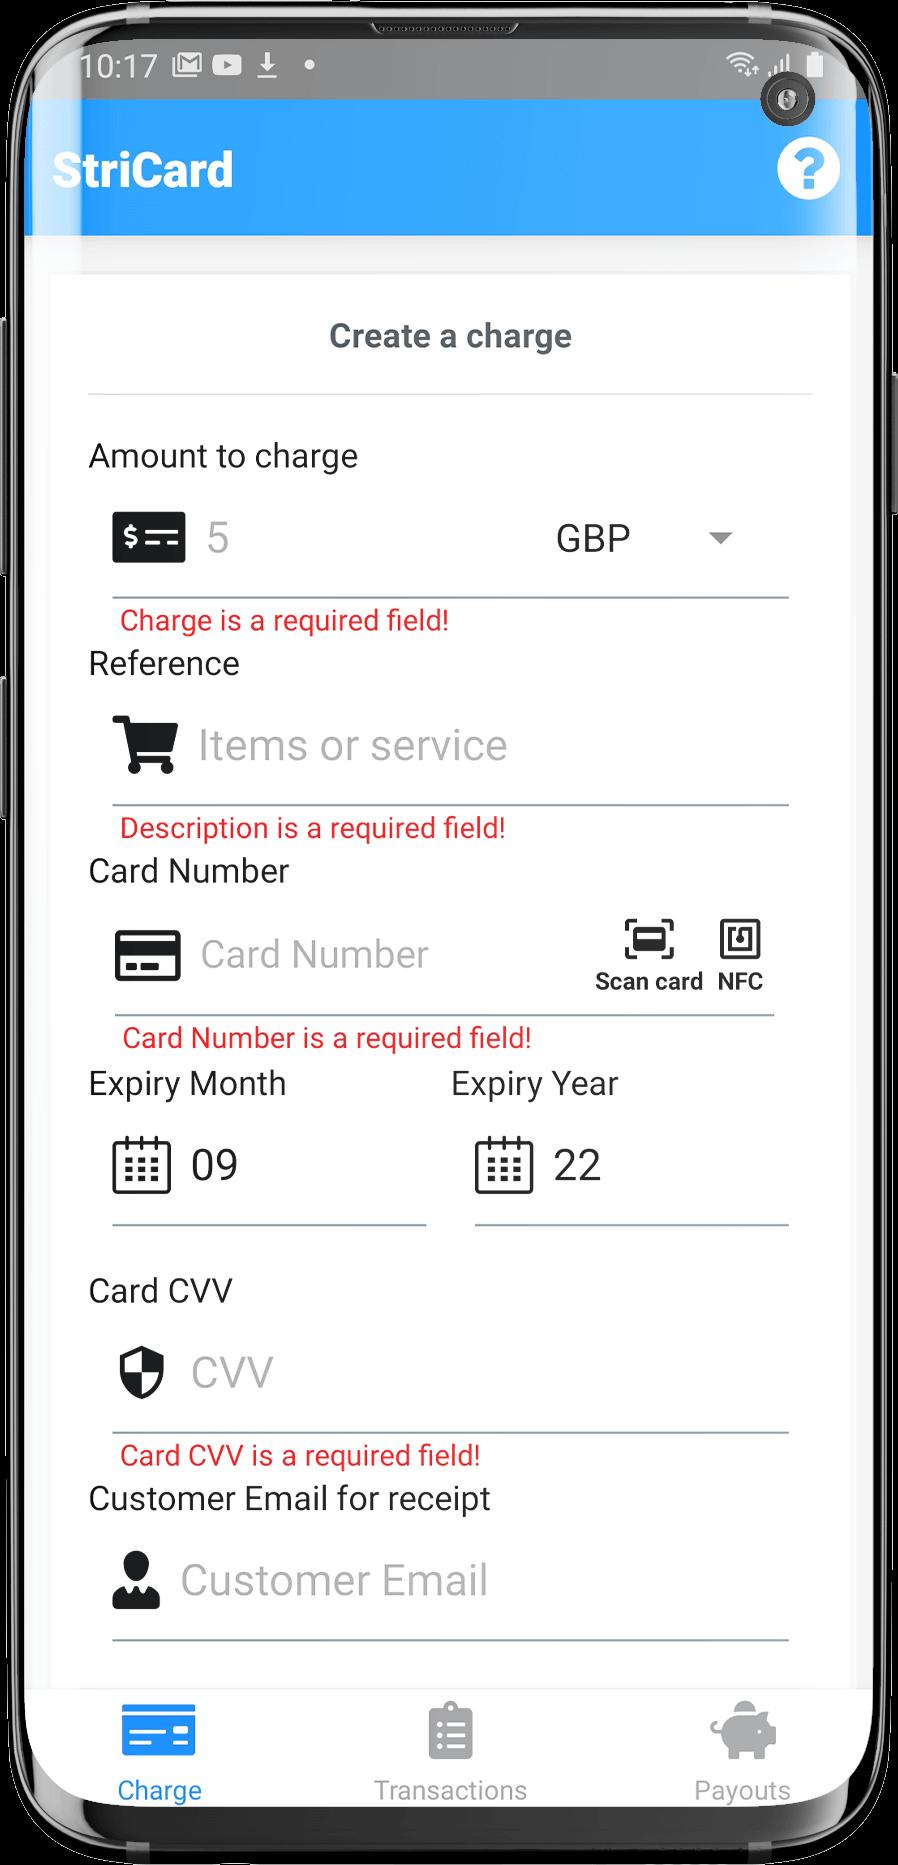 StriCard App